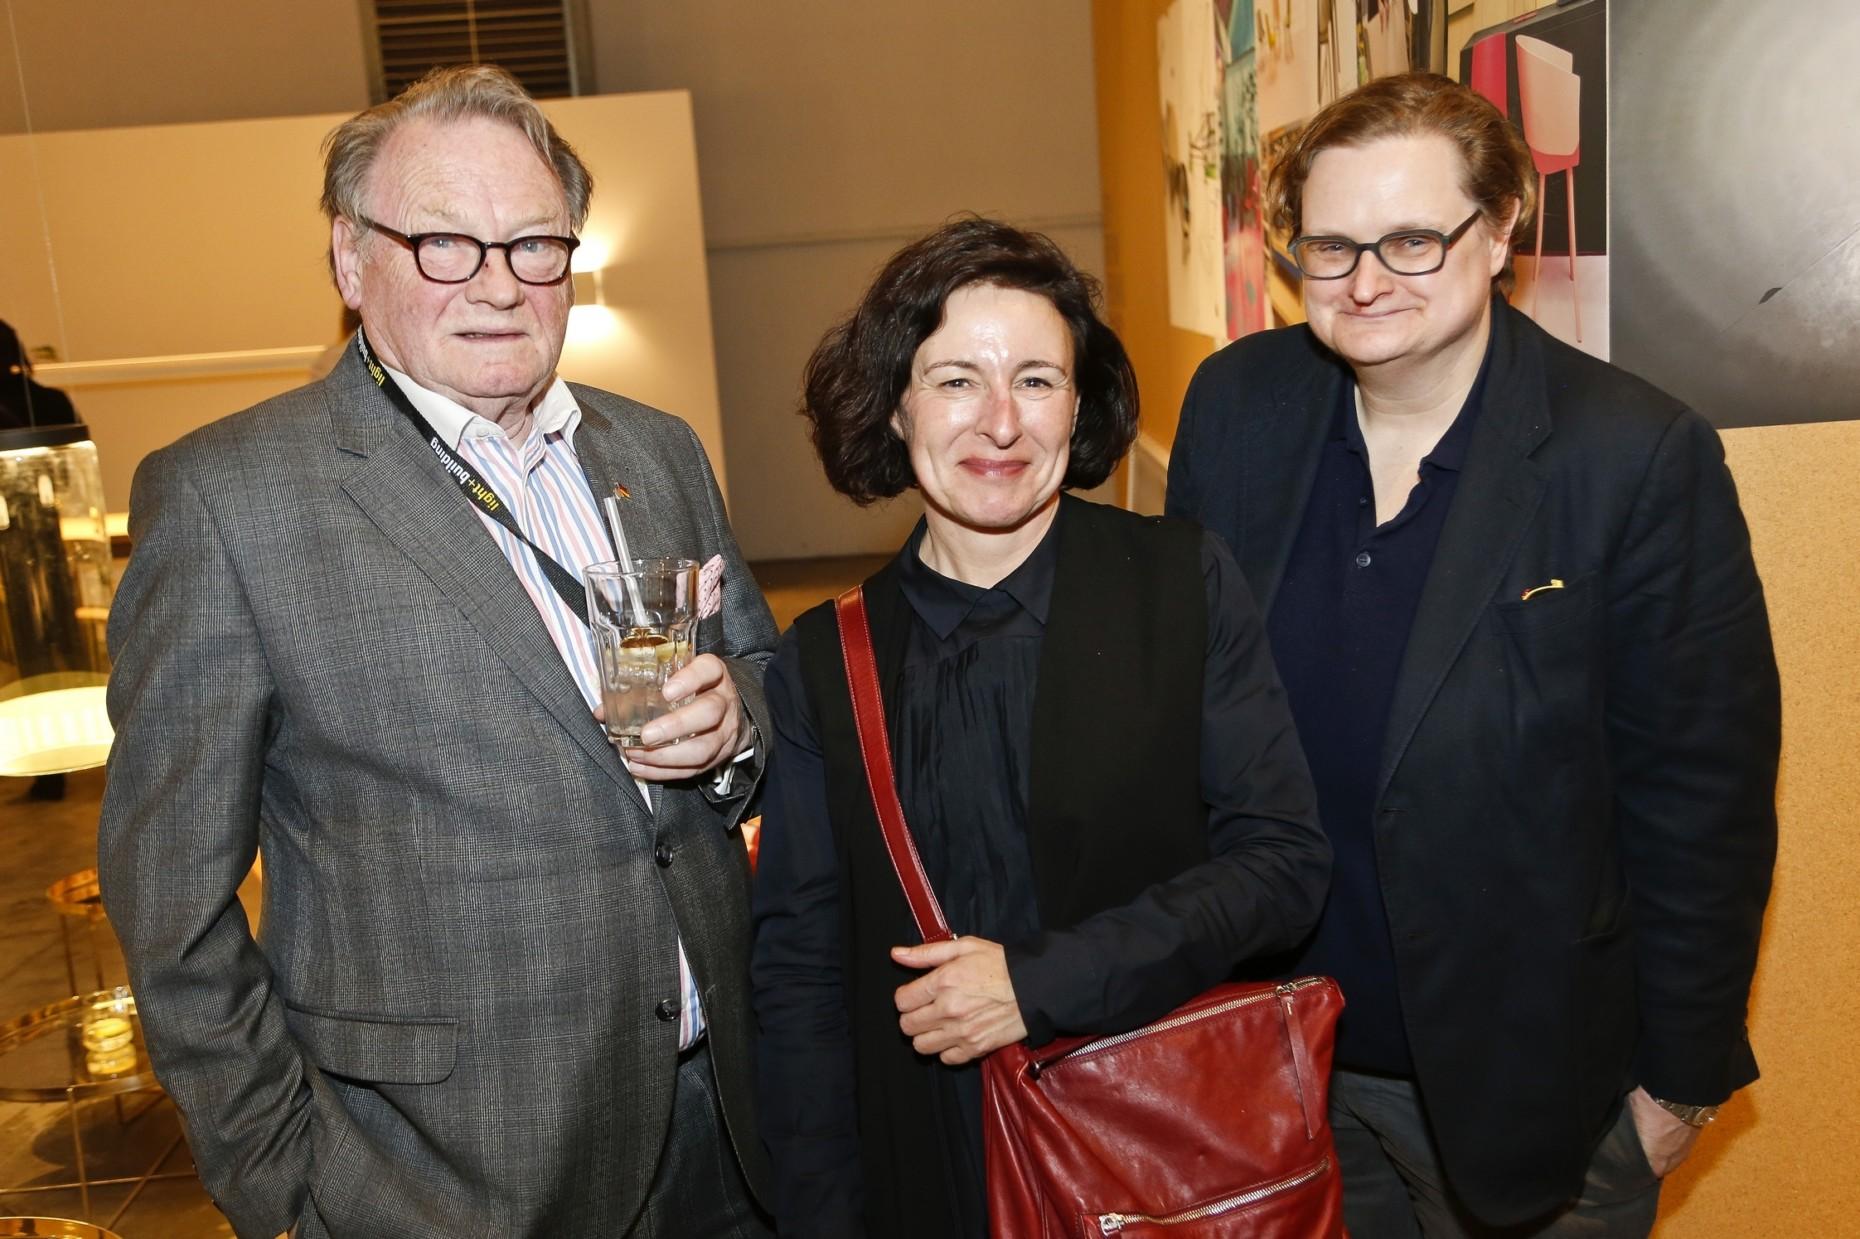 Light and Building 2018, Vibia-Event, Stylepark, e15, Karl Henschel (Sign), Meike Weber (Detail), Antonia Henschel (Sign)